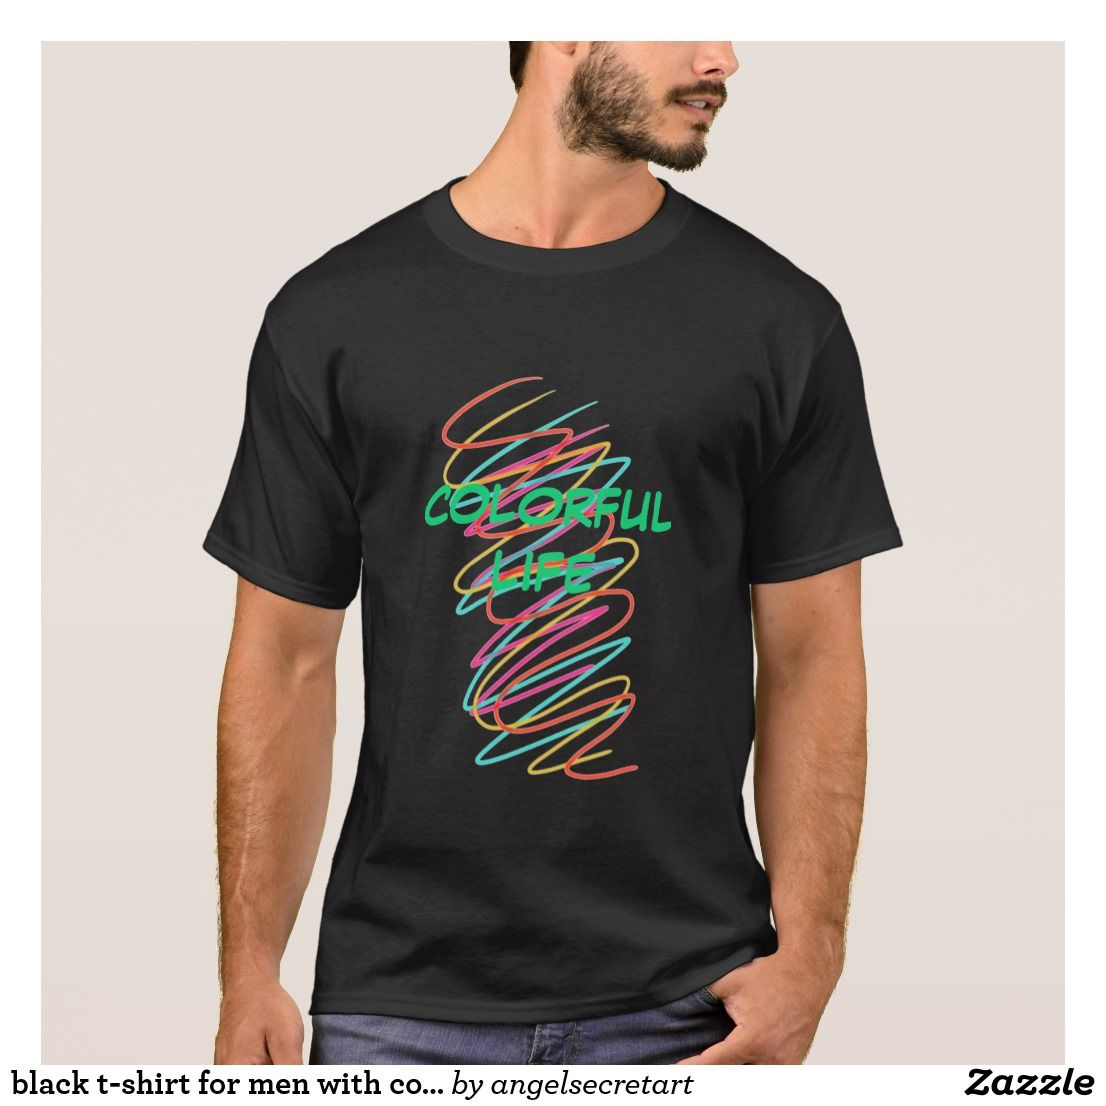 Zazzle t shirt design size - Black T Shirt For Men With Colorful Spiral Design